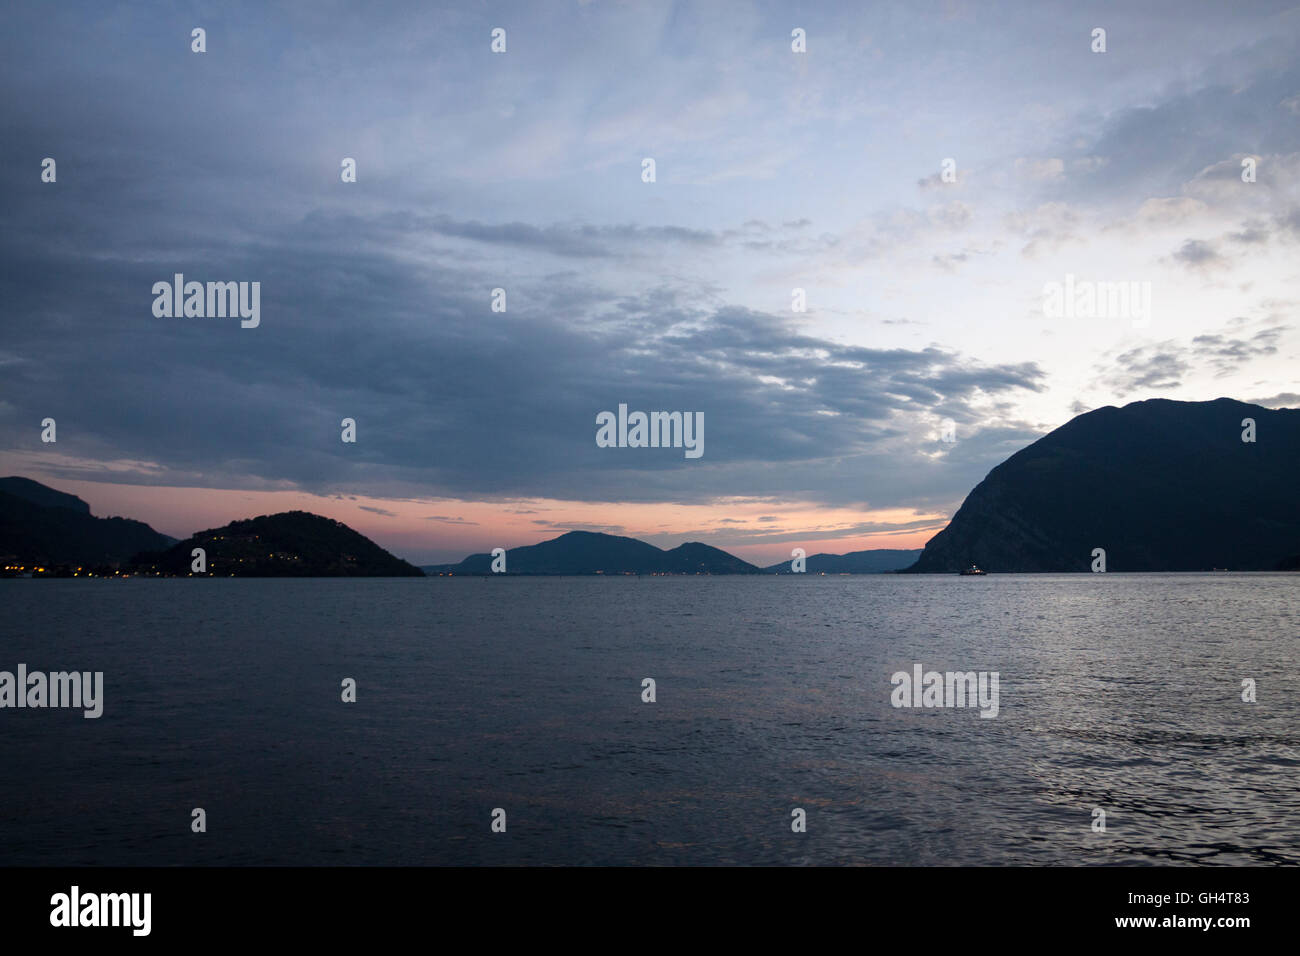 Summer sunset over Lake Iseo. Sulzano, Lombardy. Italy - Stock Image